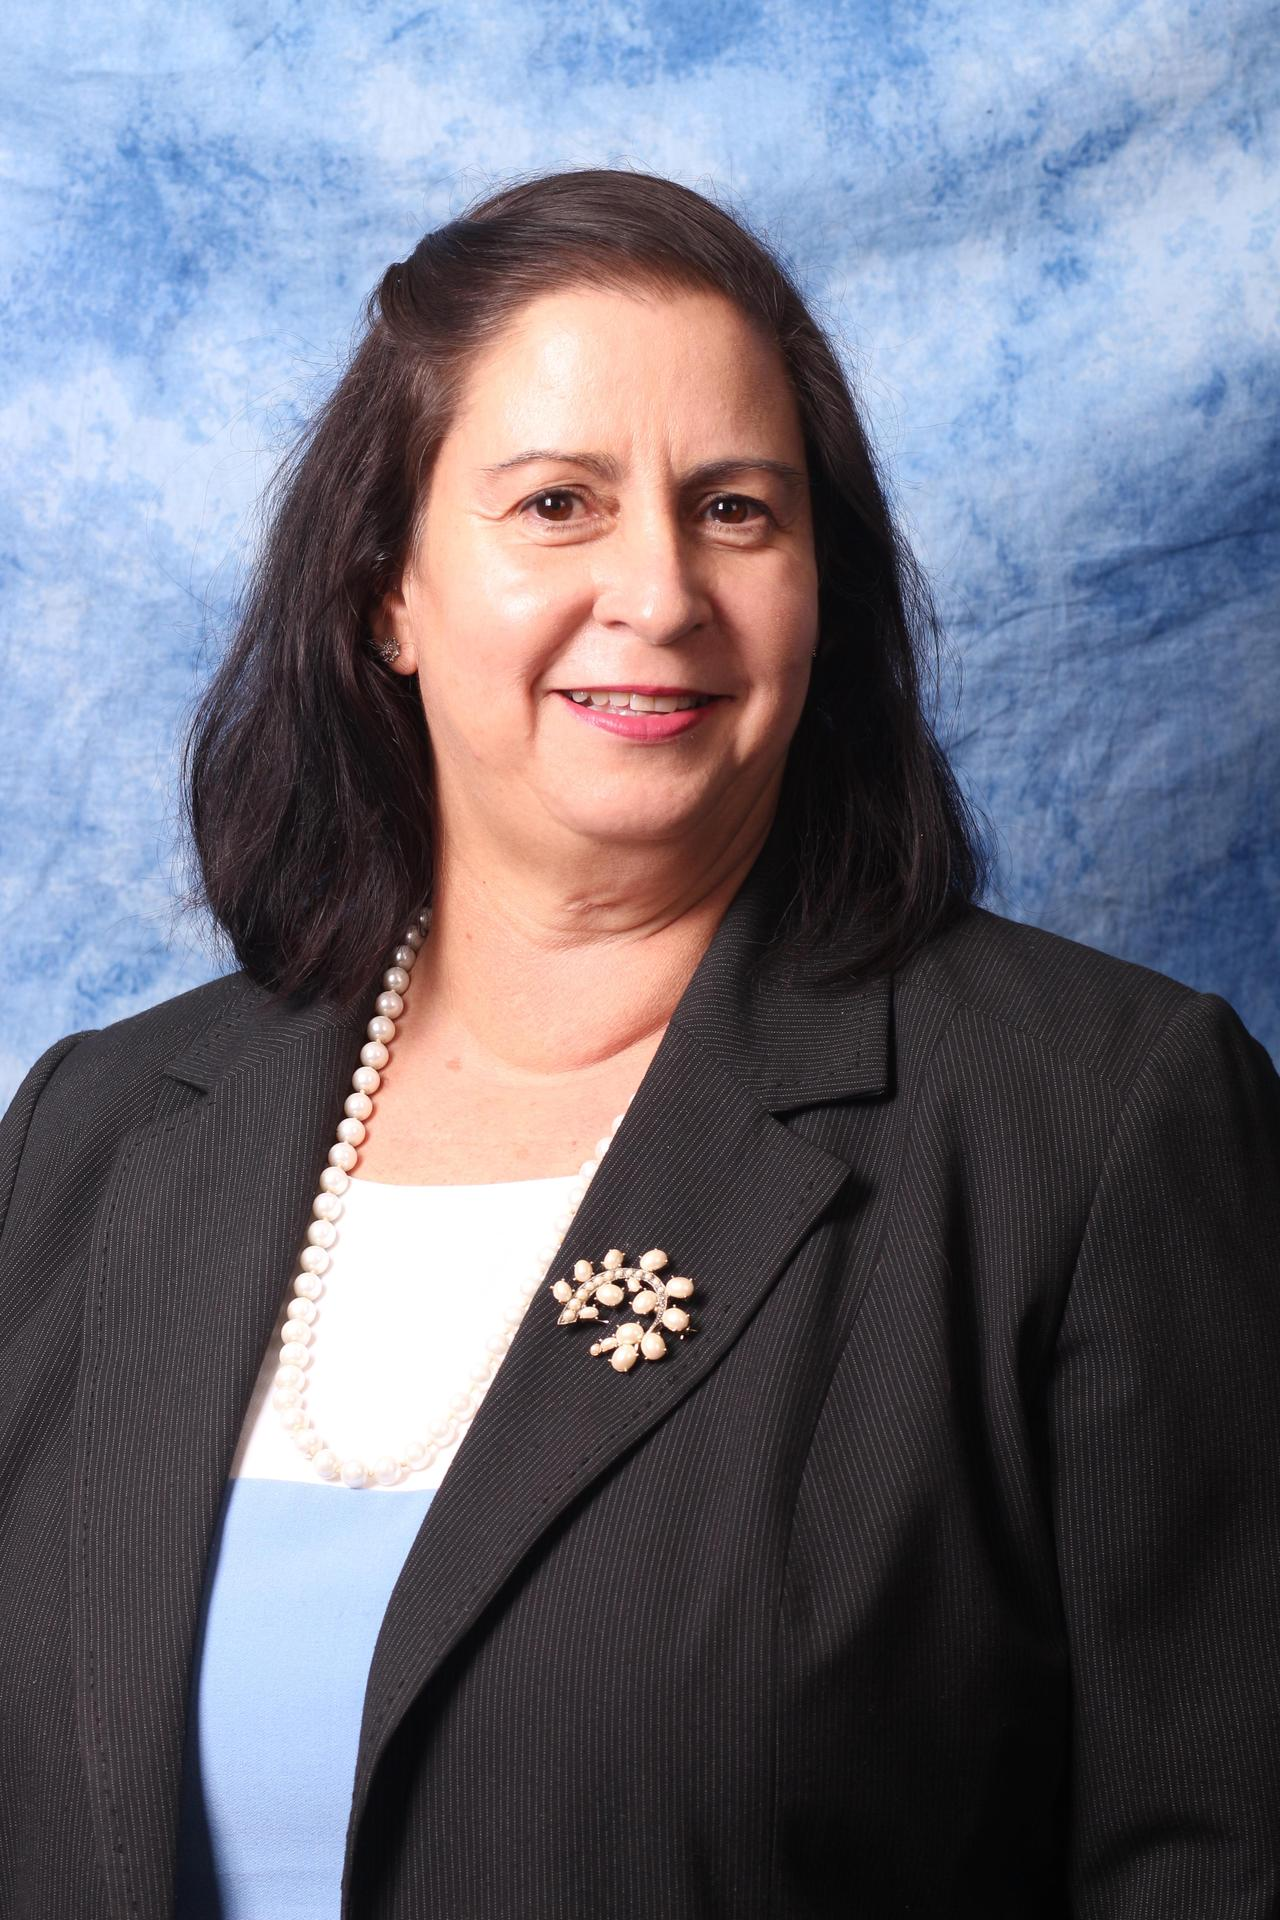 Superintendent Silvia Abbato portrait